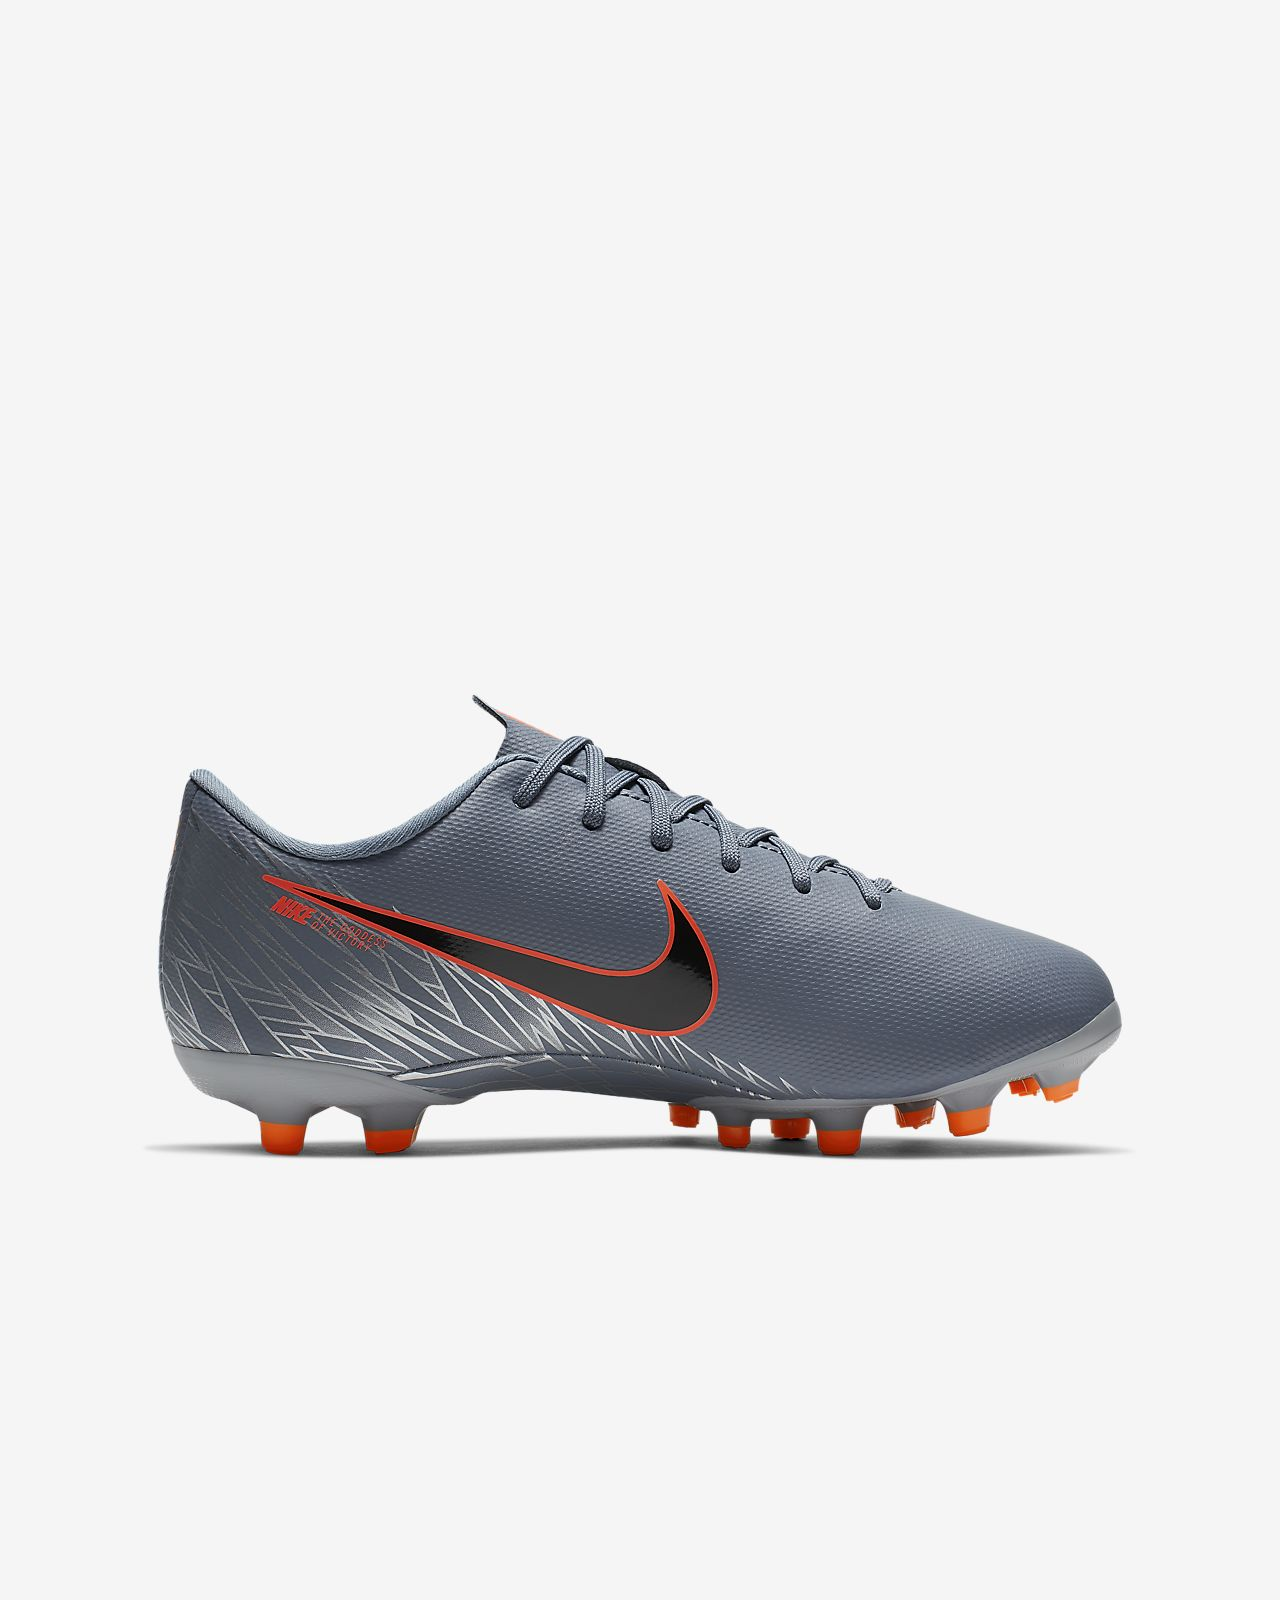 983c25fb240b ... Nike Jr. Mercurial Vapor XII Academy Younger/Older Kids' Multi-Ground  Football